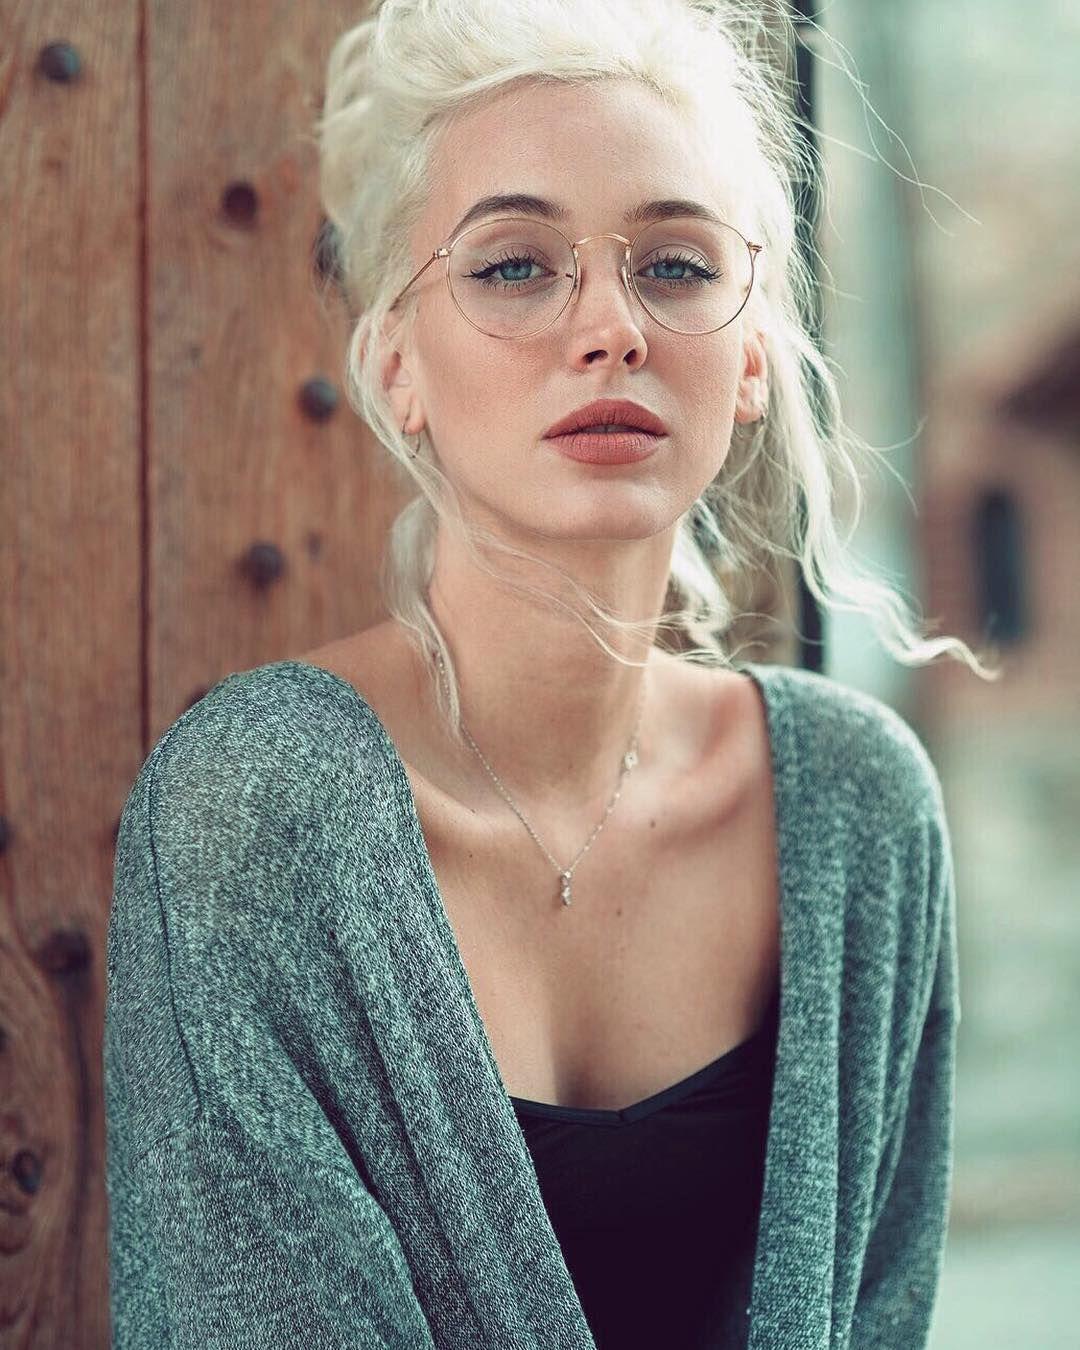 Name Carolina Porqueddu From Italy Ethnicity Italian Hair